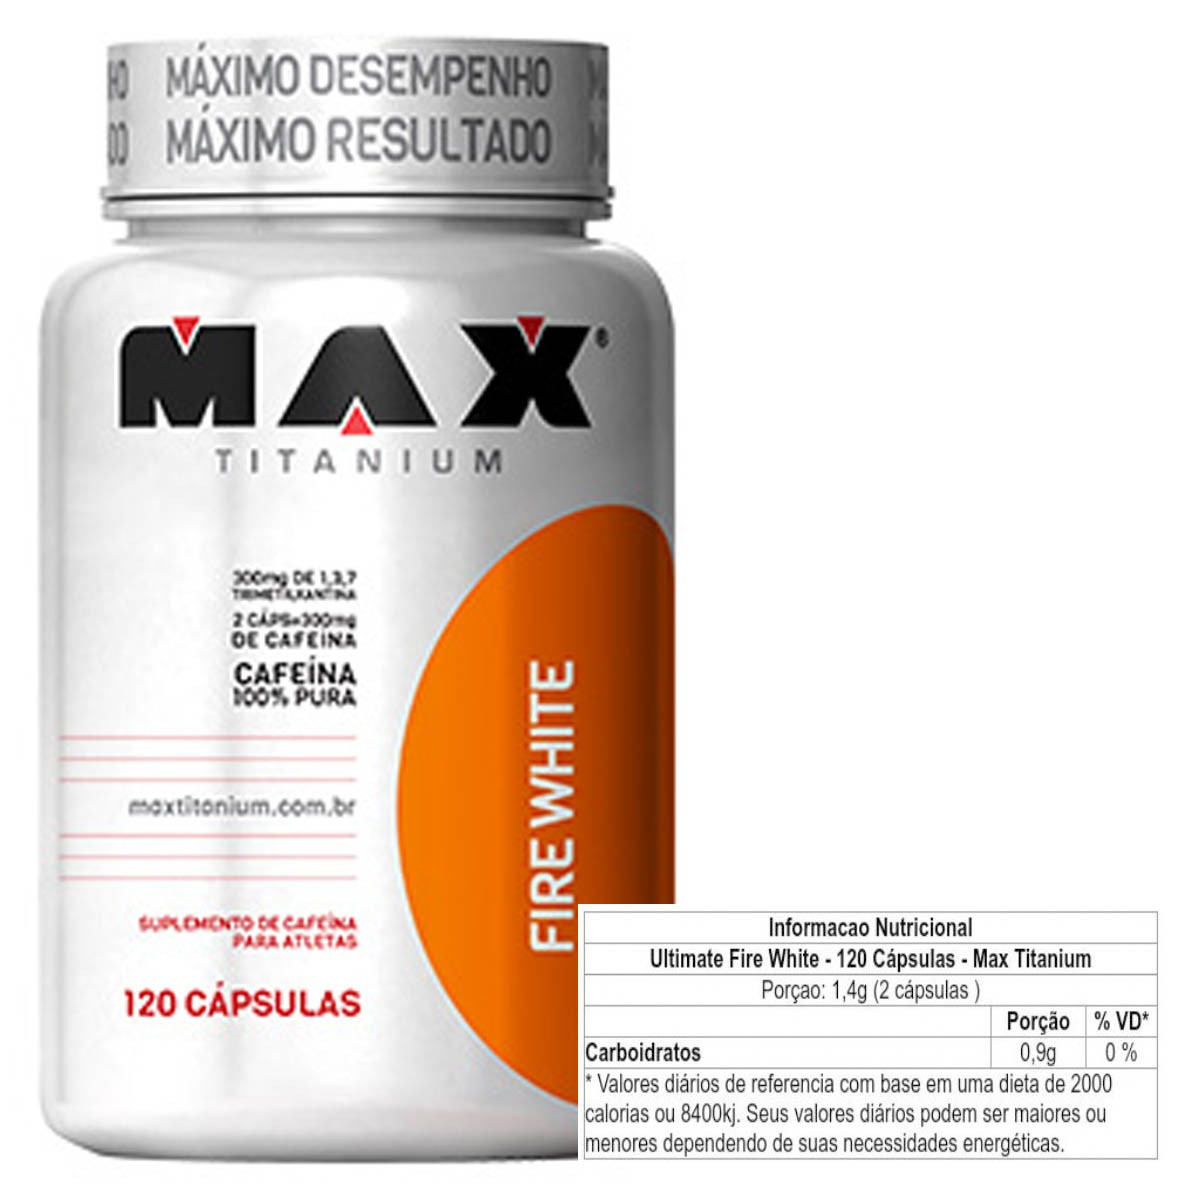 Fire White 120 Cápsulas - Max Titanium